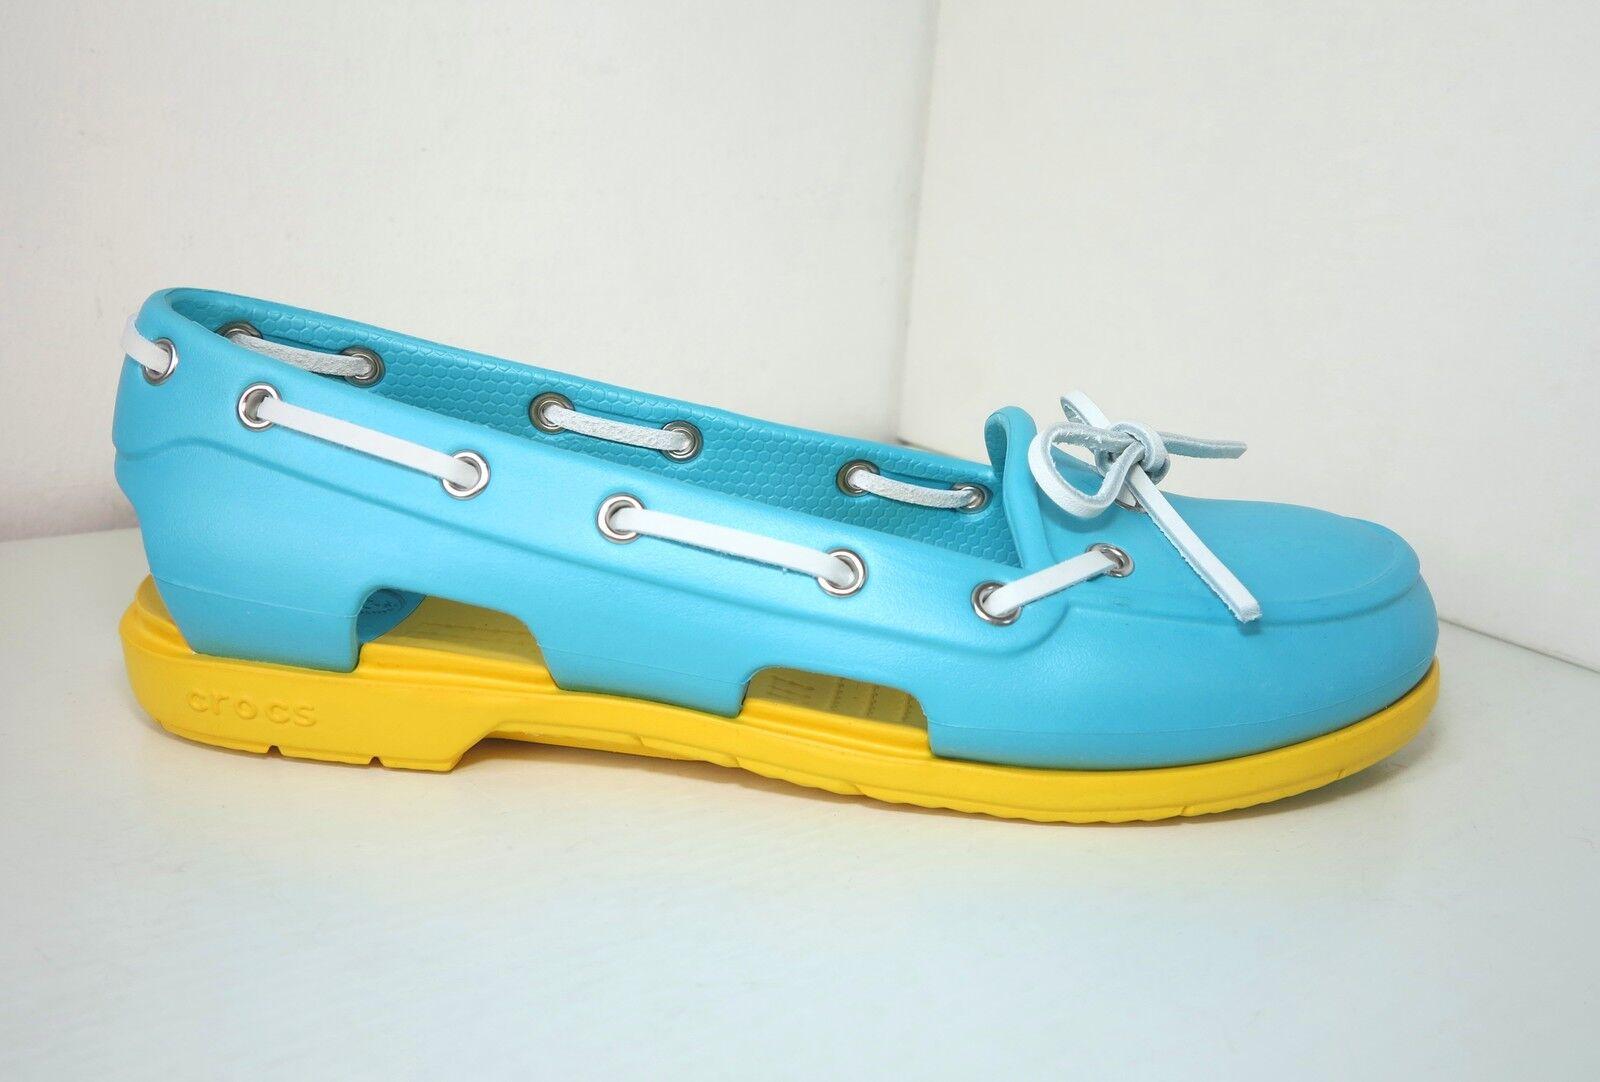 Crocs Ballerina Segelschuhe türkis W 10 40 41  beach line boat schuhe aqua gelb